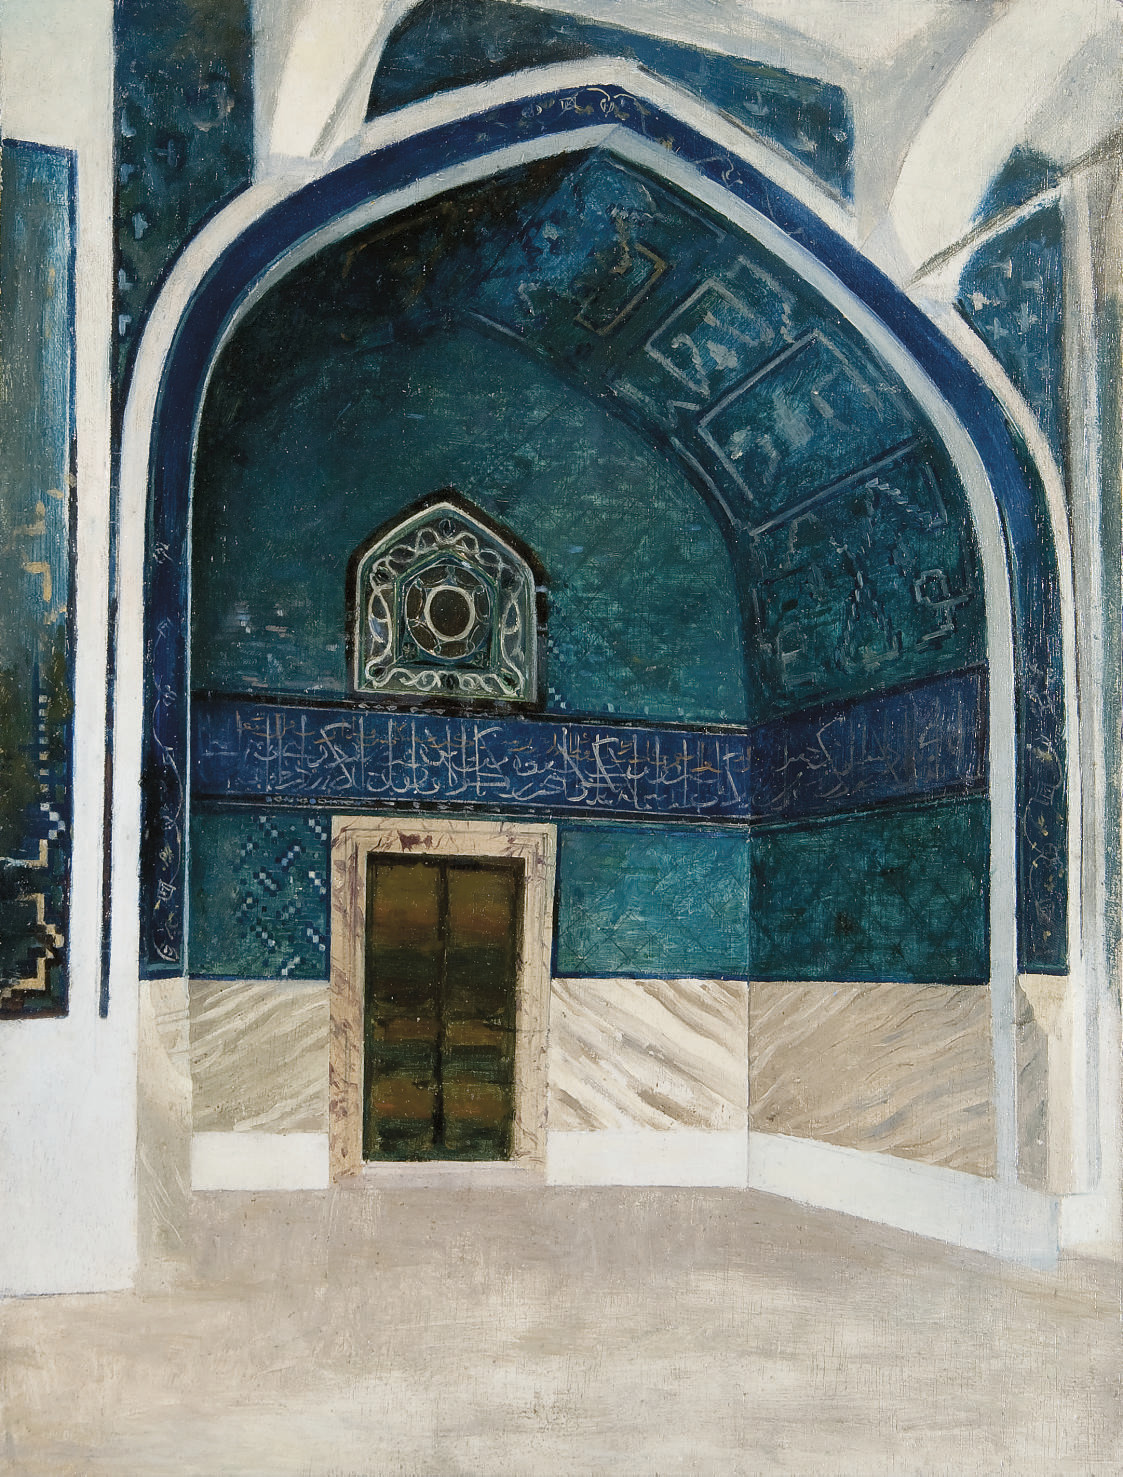 Le Kiosque Cinli au palais de Topkapi